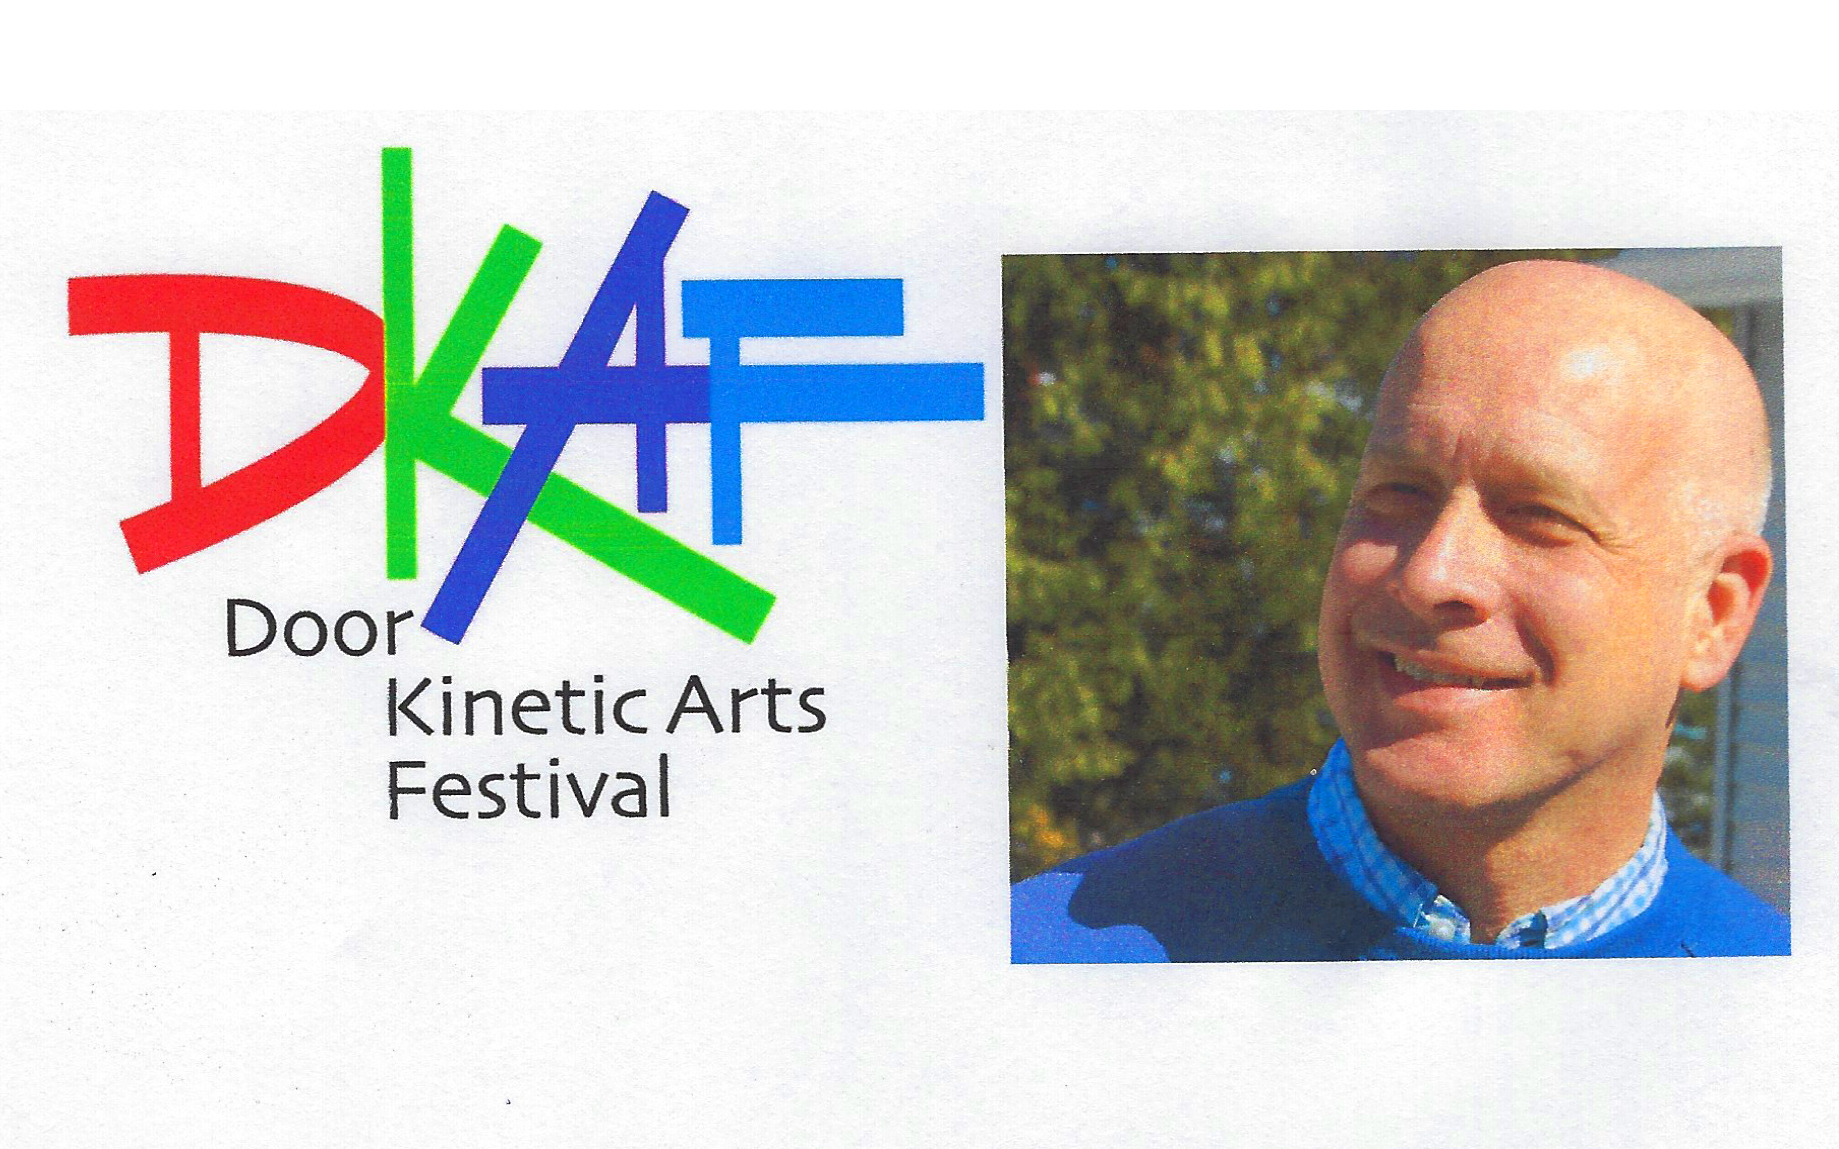 Eric Simonson and 2019 DKAF logo_1559424306989.jpg.jpg